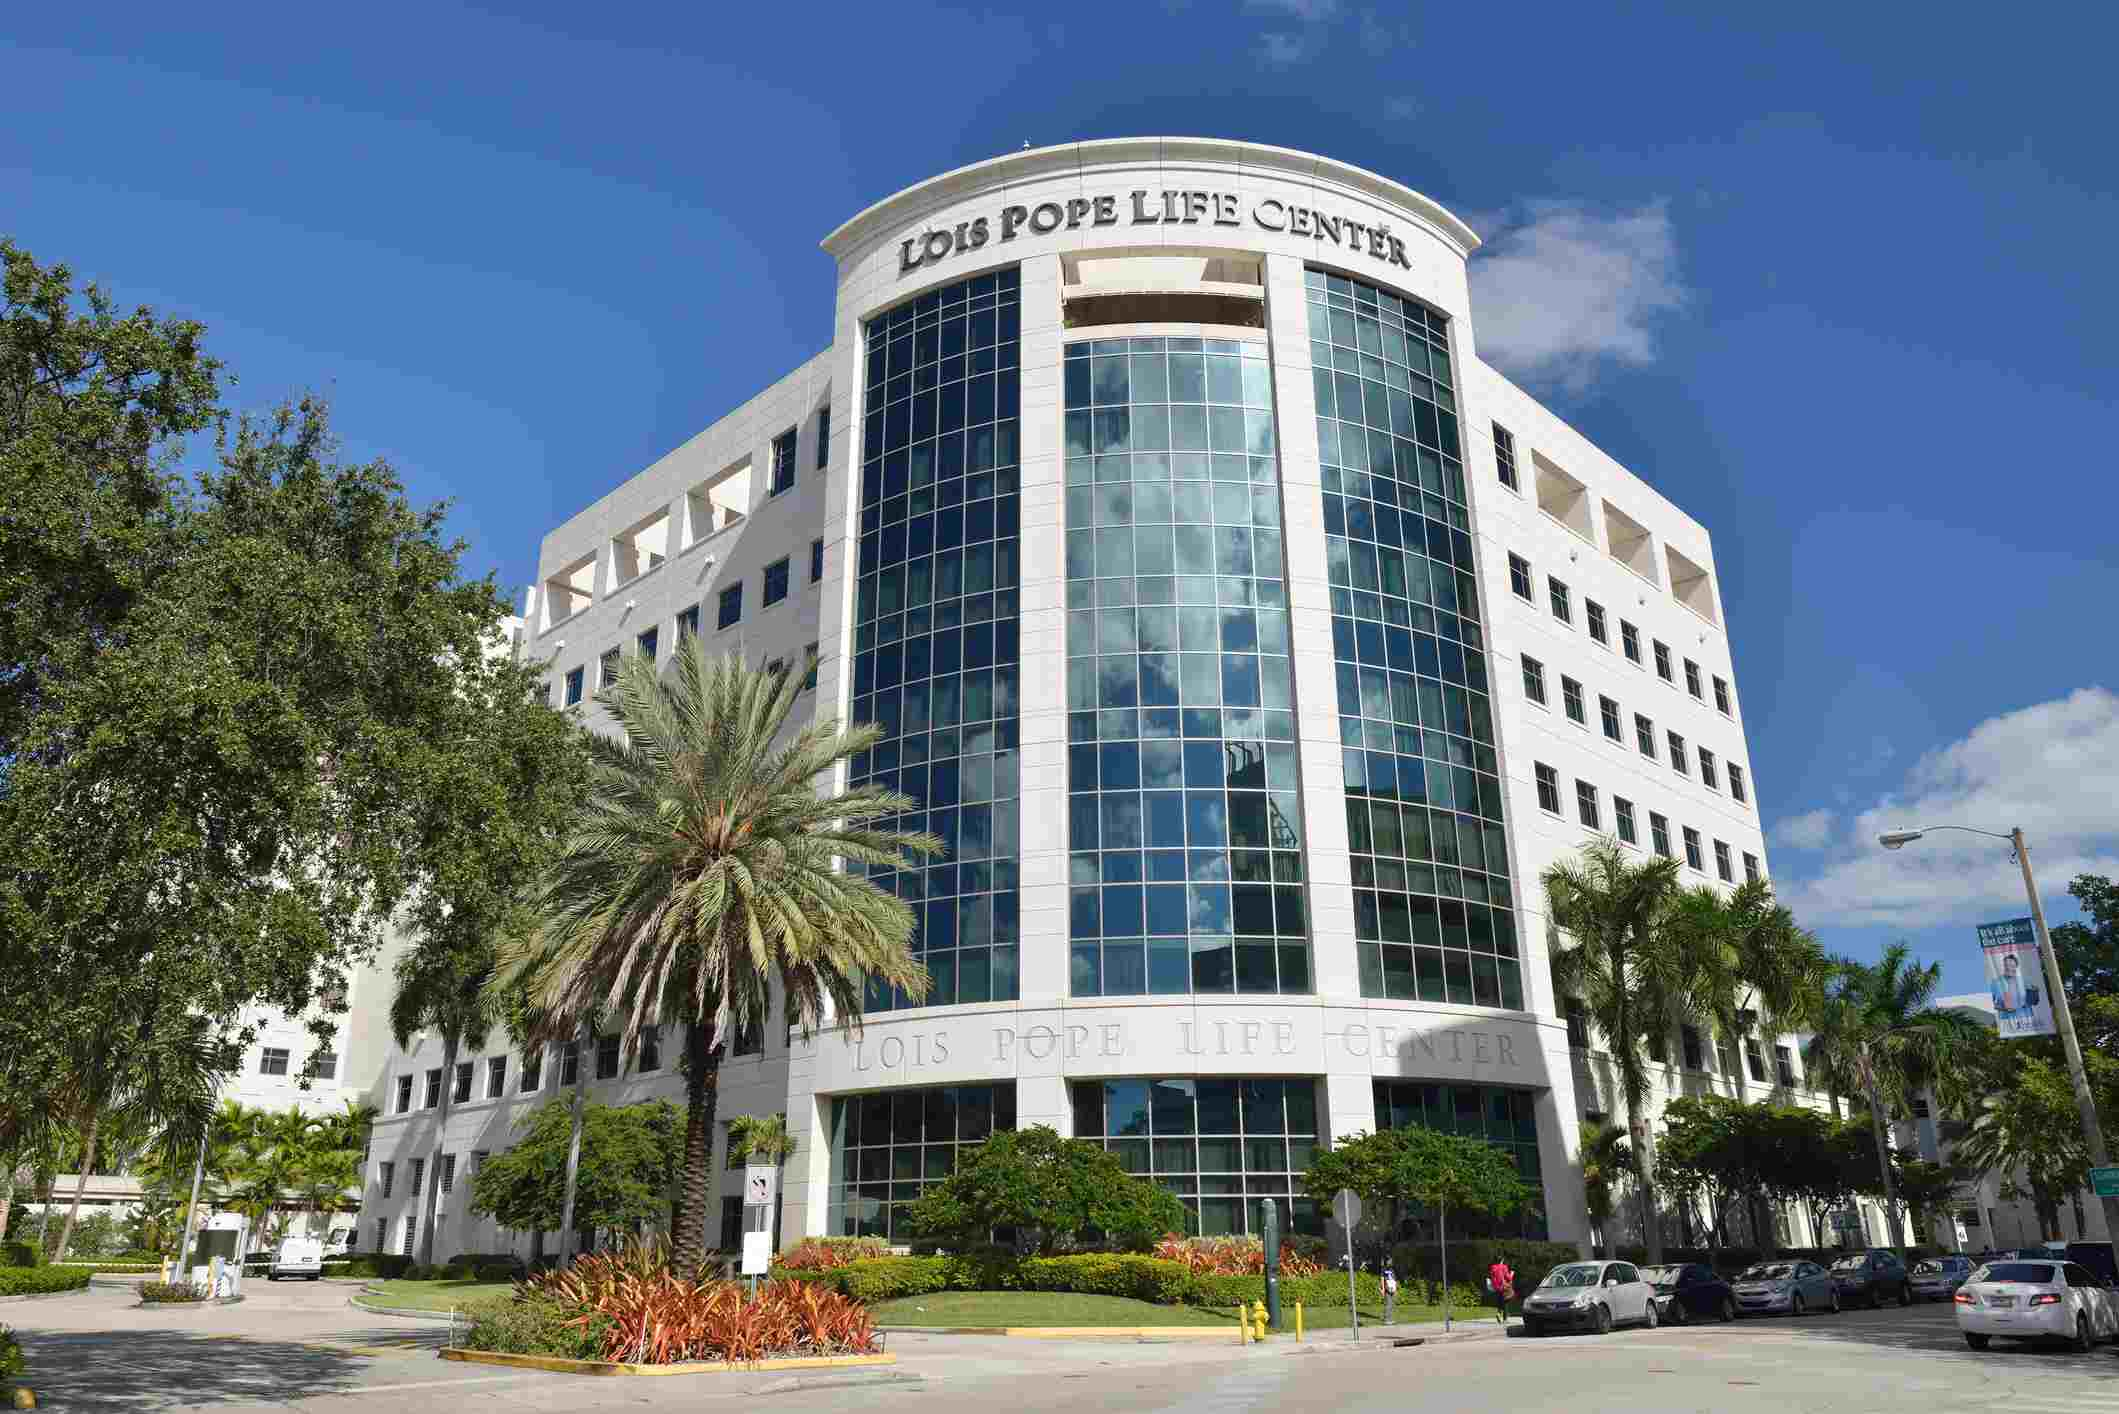 The Louis Pope Life Center in Miami